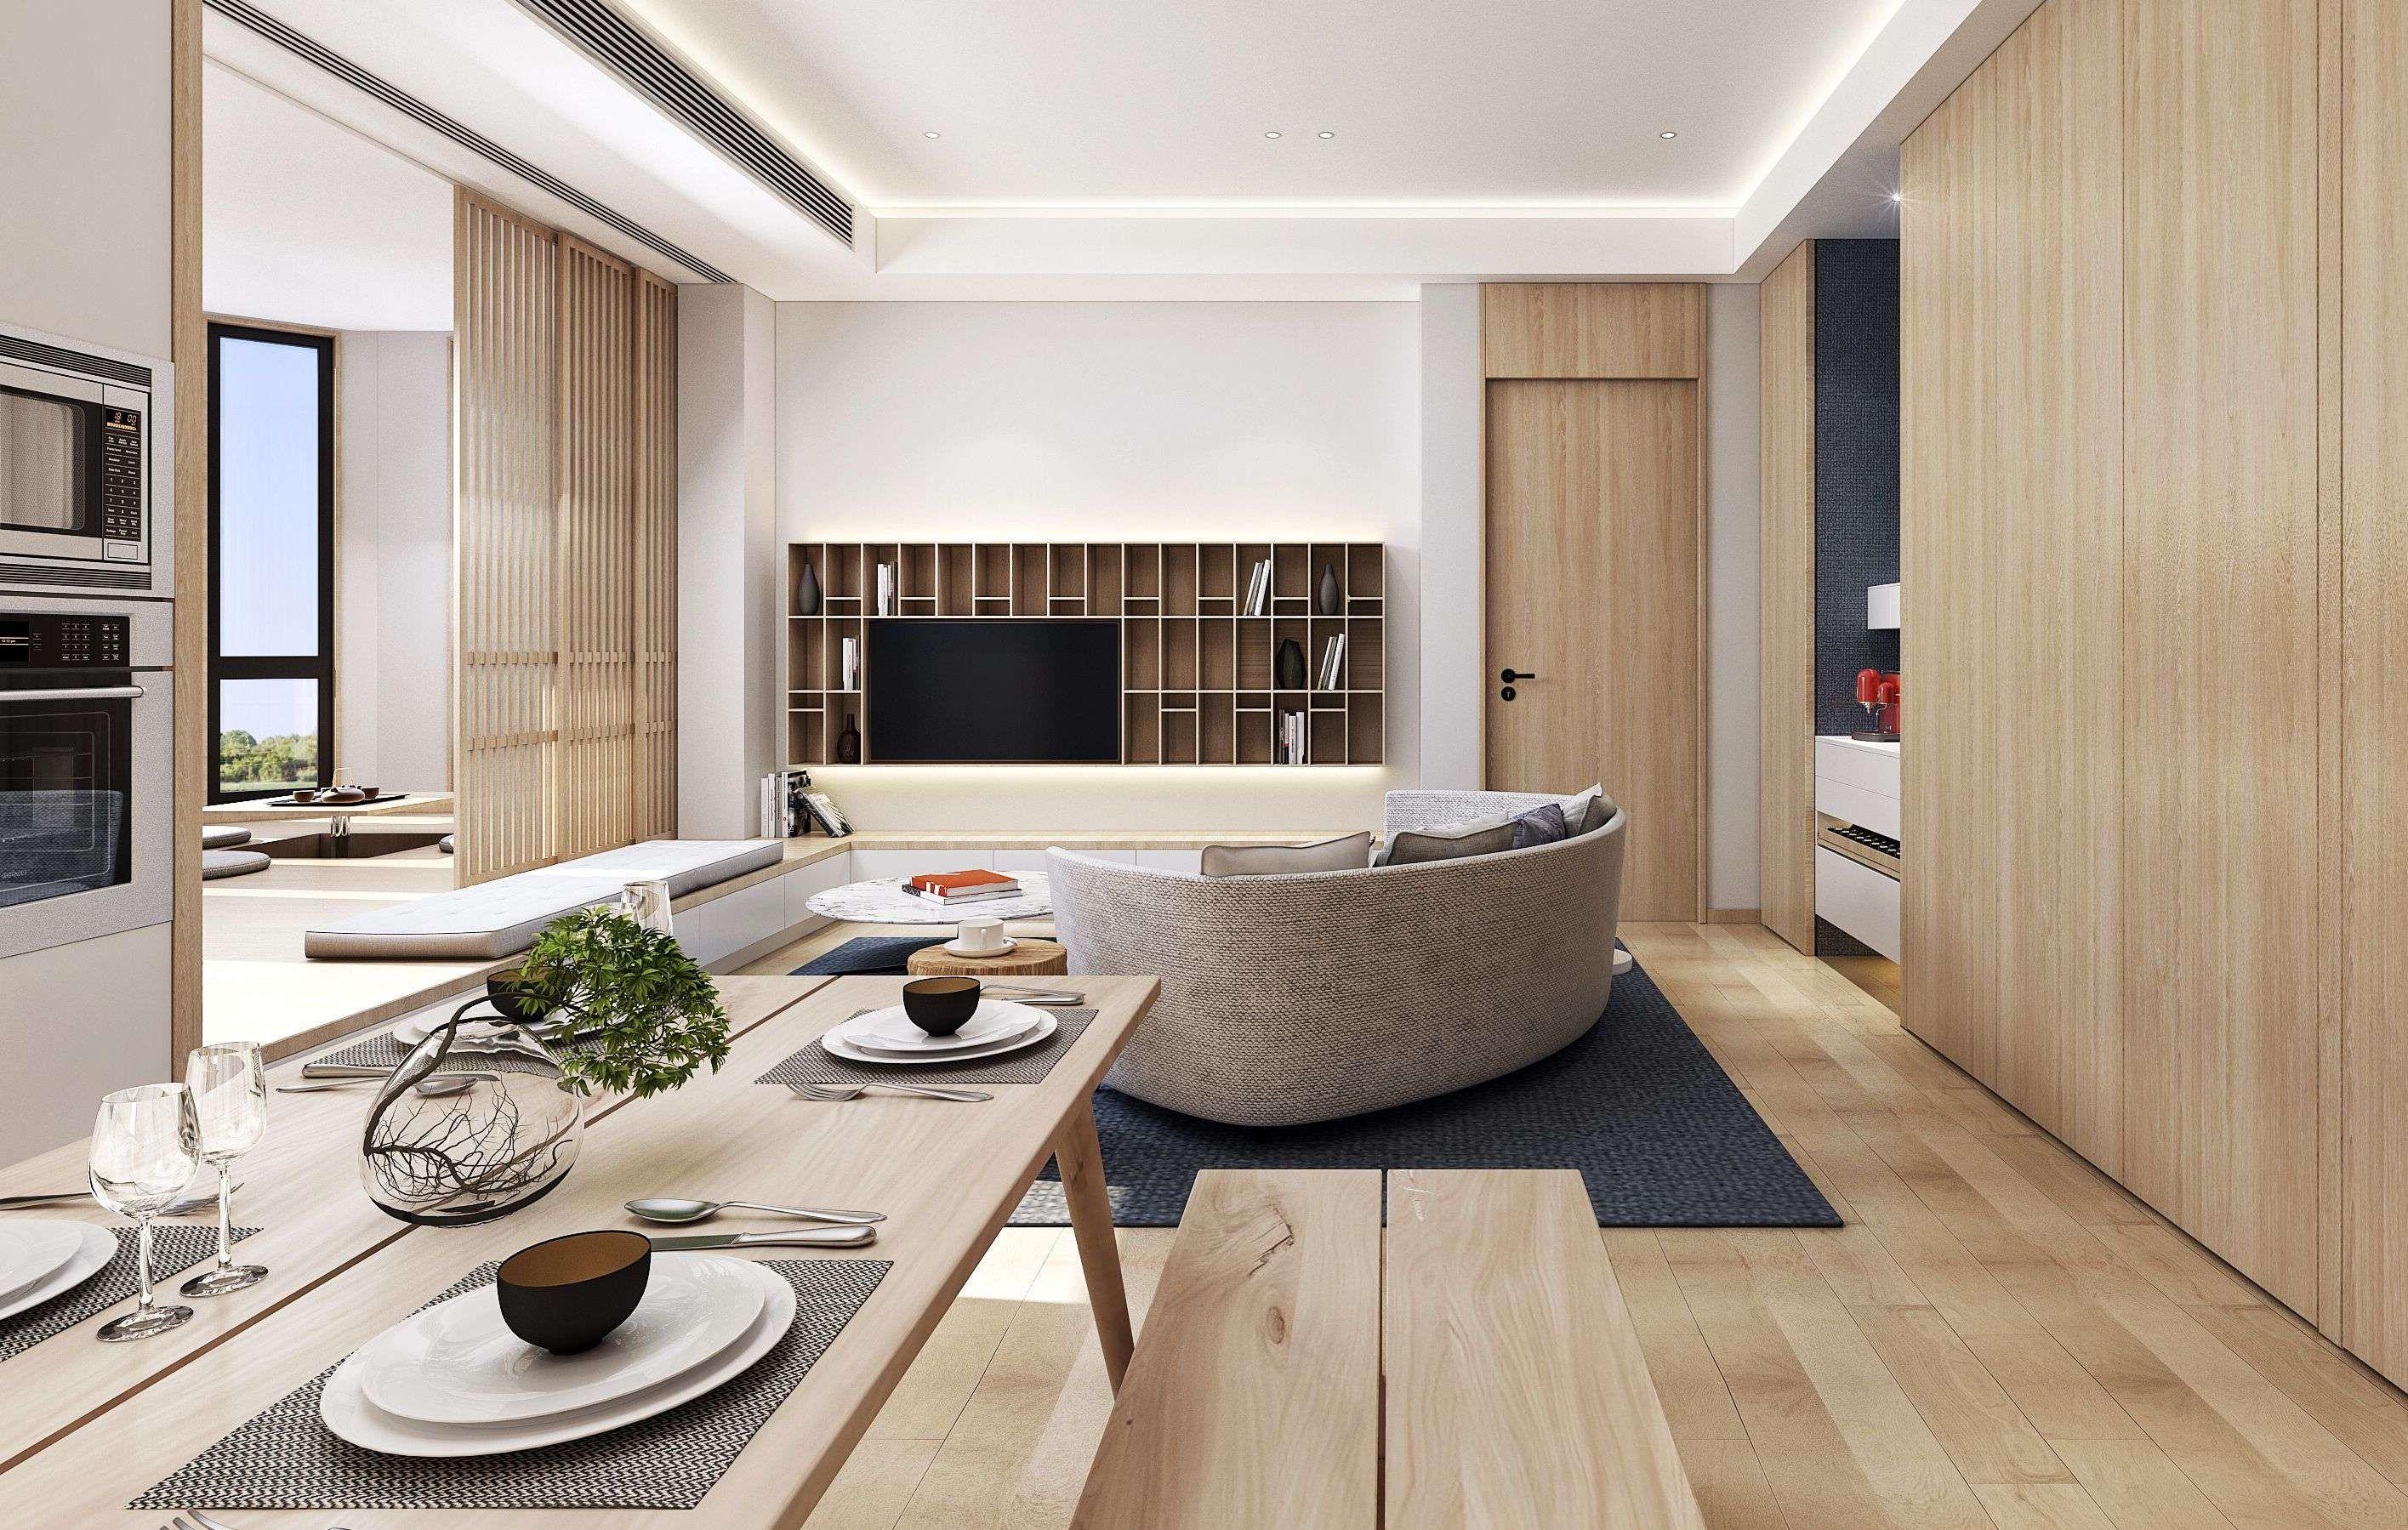 32 Wonderful Japanese Living Room Ideas Having A Neat And Comfortable Japanese Living Room Is Every Japanese Living Rooms Living Room Decor Japanese Interior